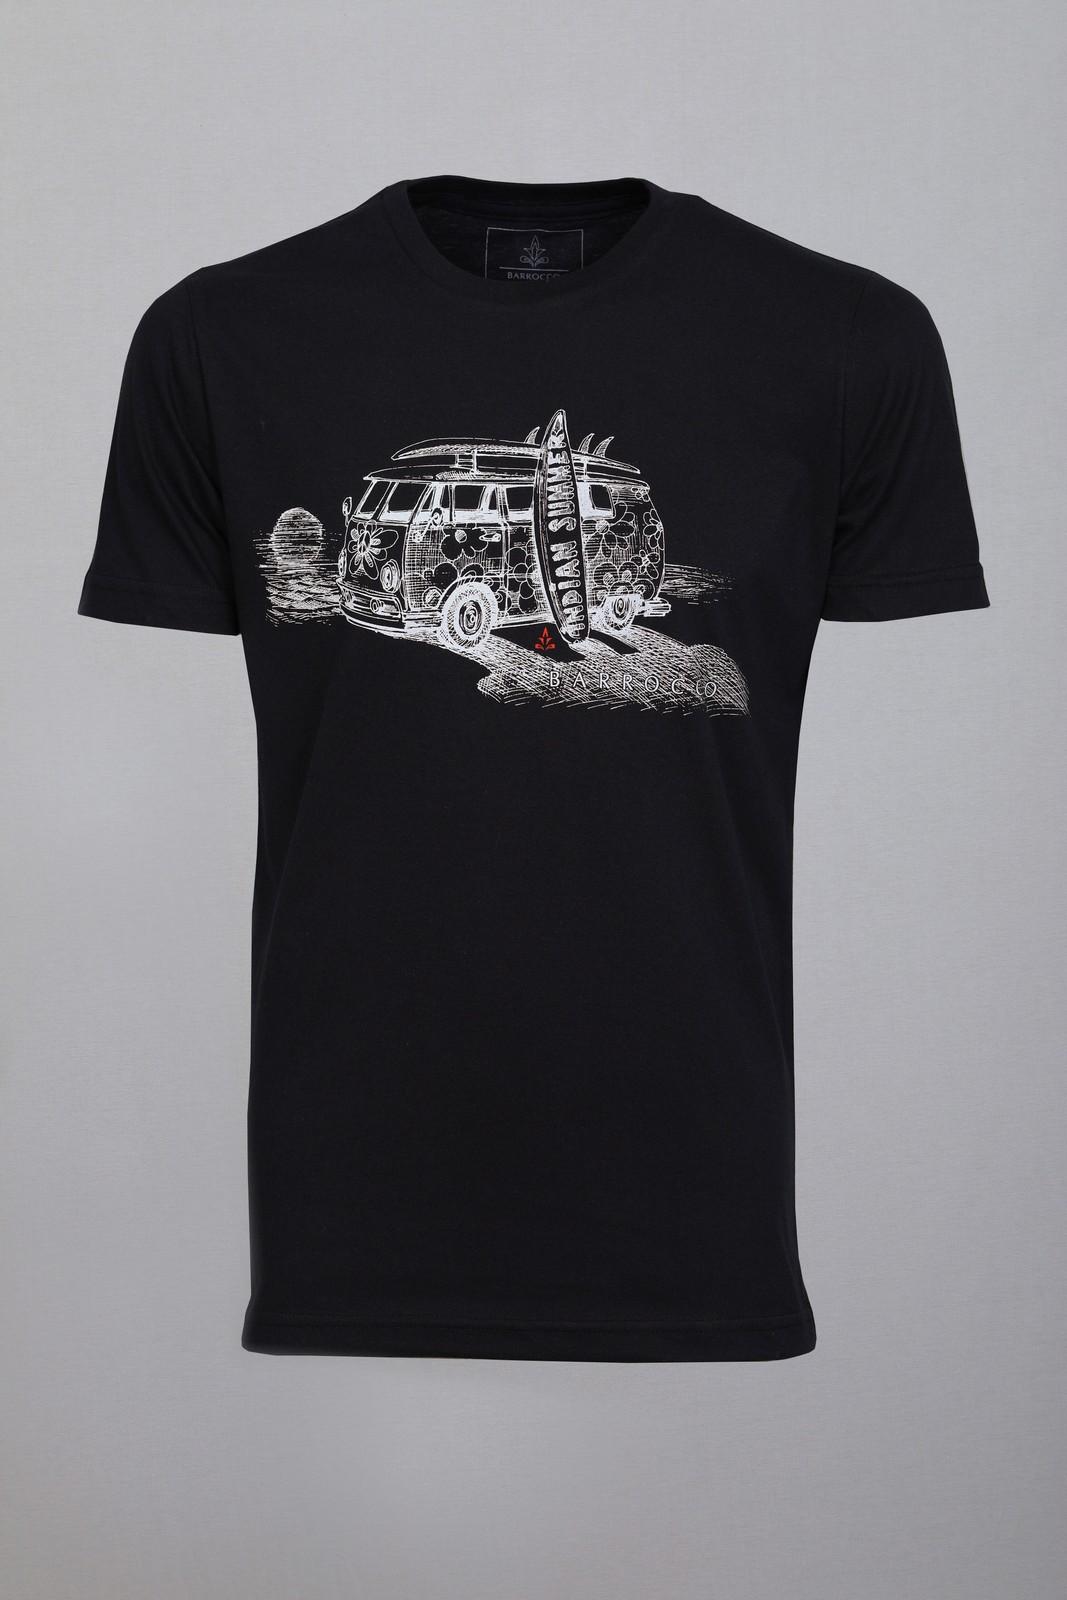 Camiseta Barrocco Kombi - FRETE GRÁTIS